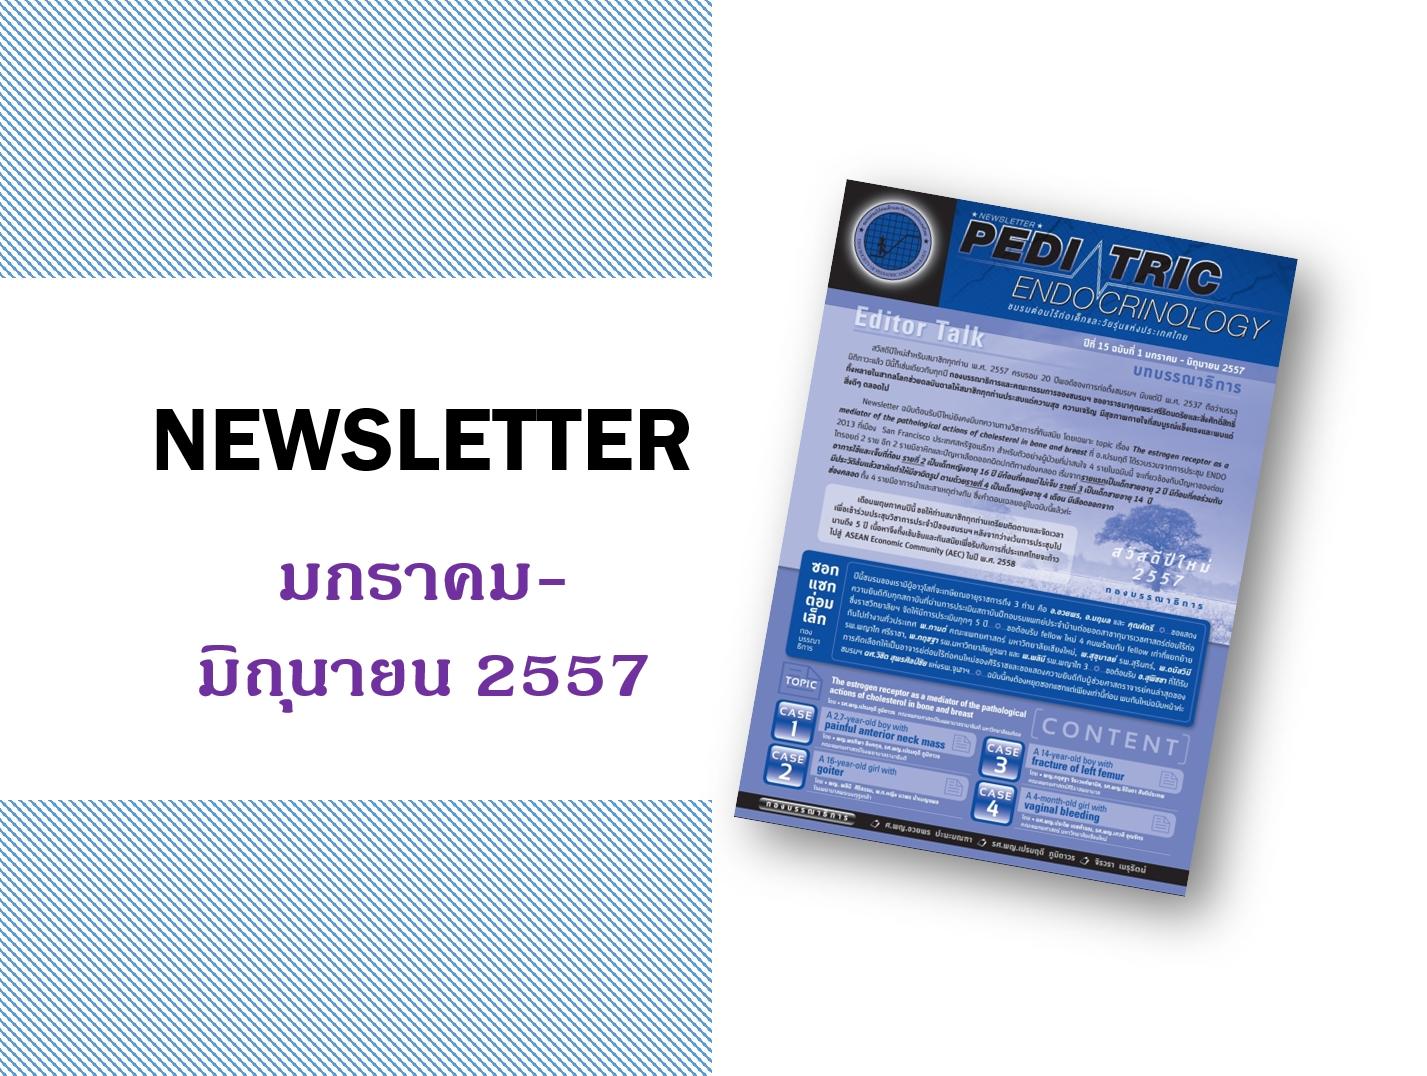 Newsletter มกราคม-มิถุนายน 2557